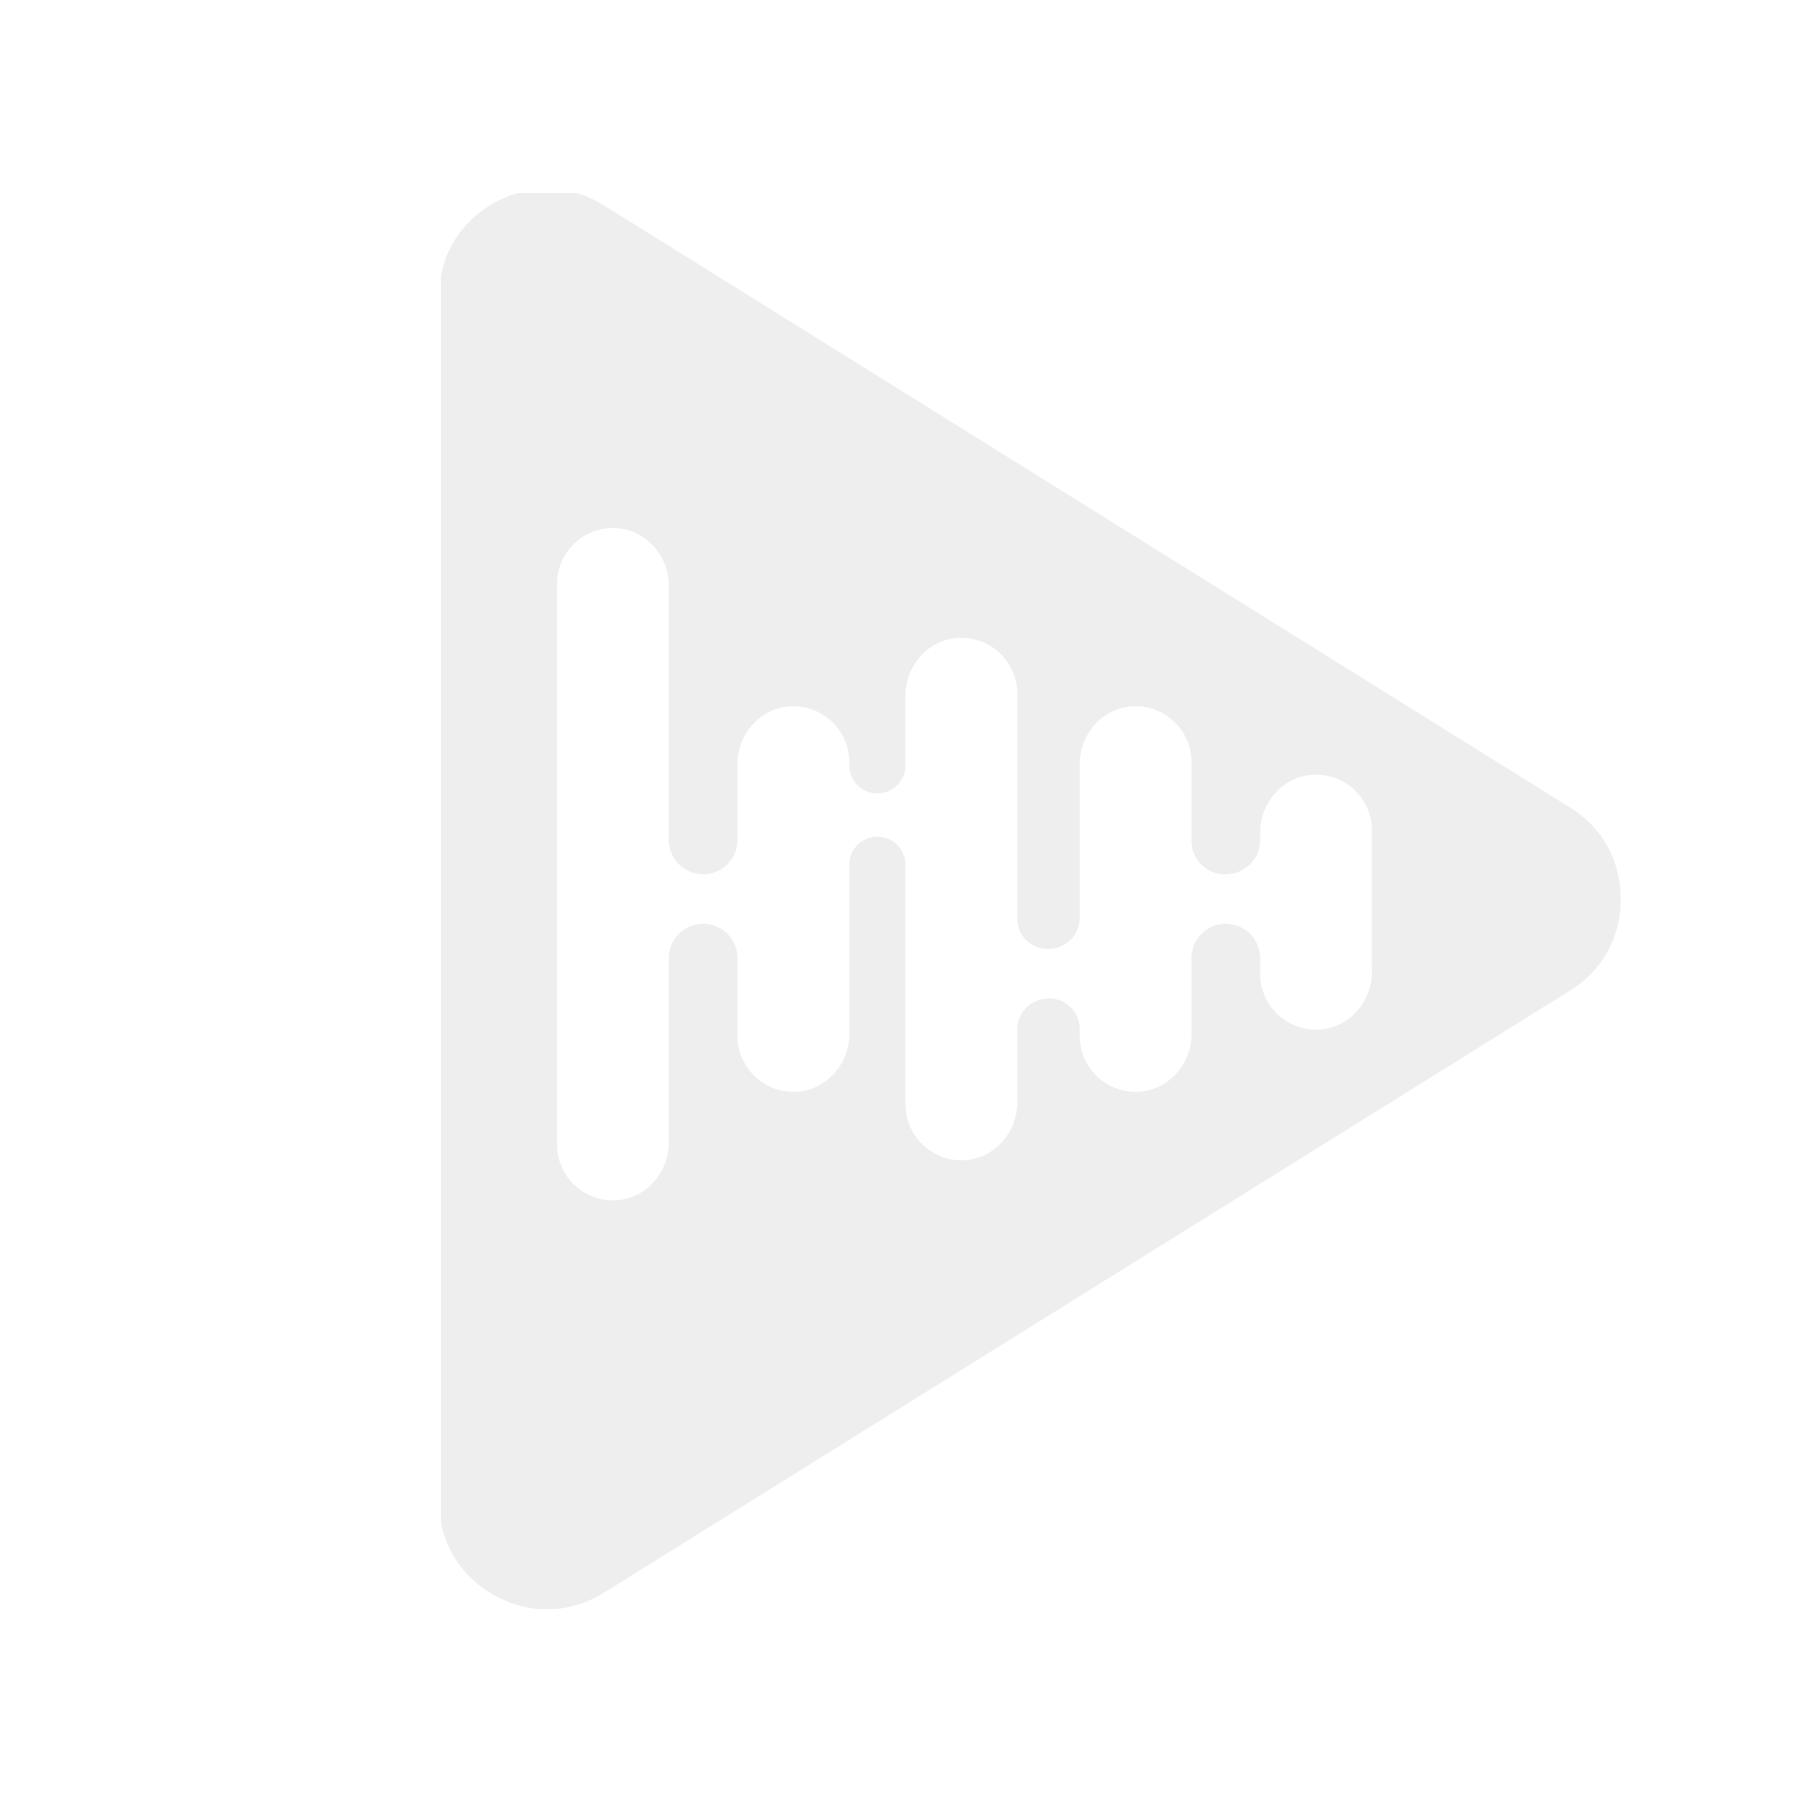 Kufatec Fistune 40148-1 - DAB-integrering, BMW